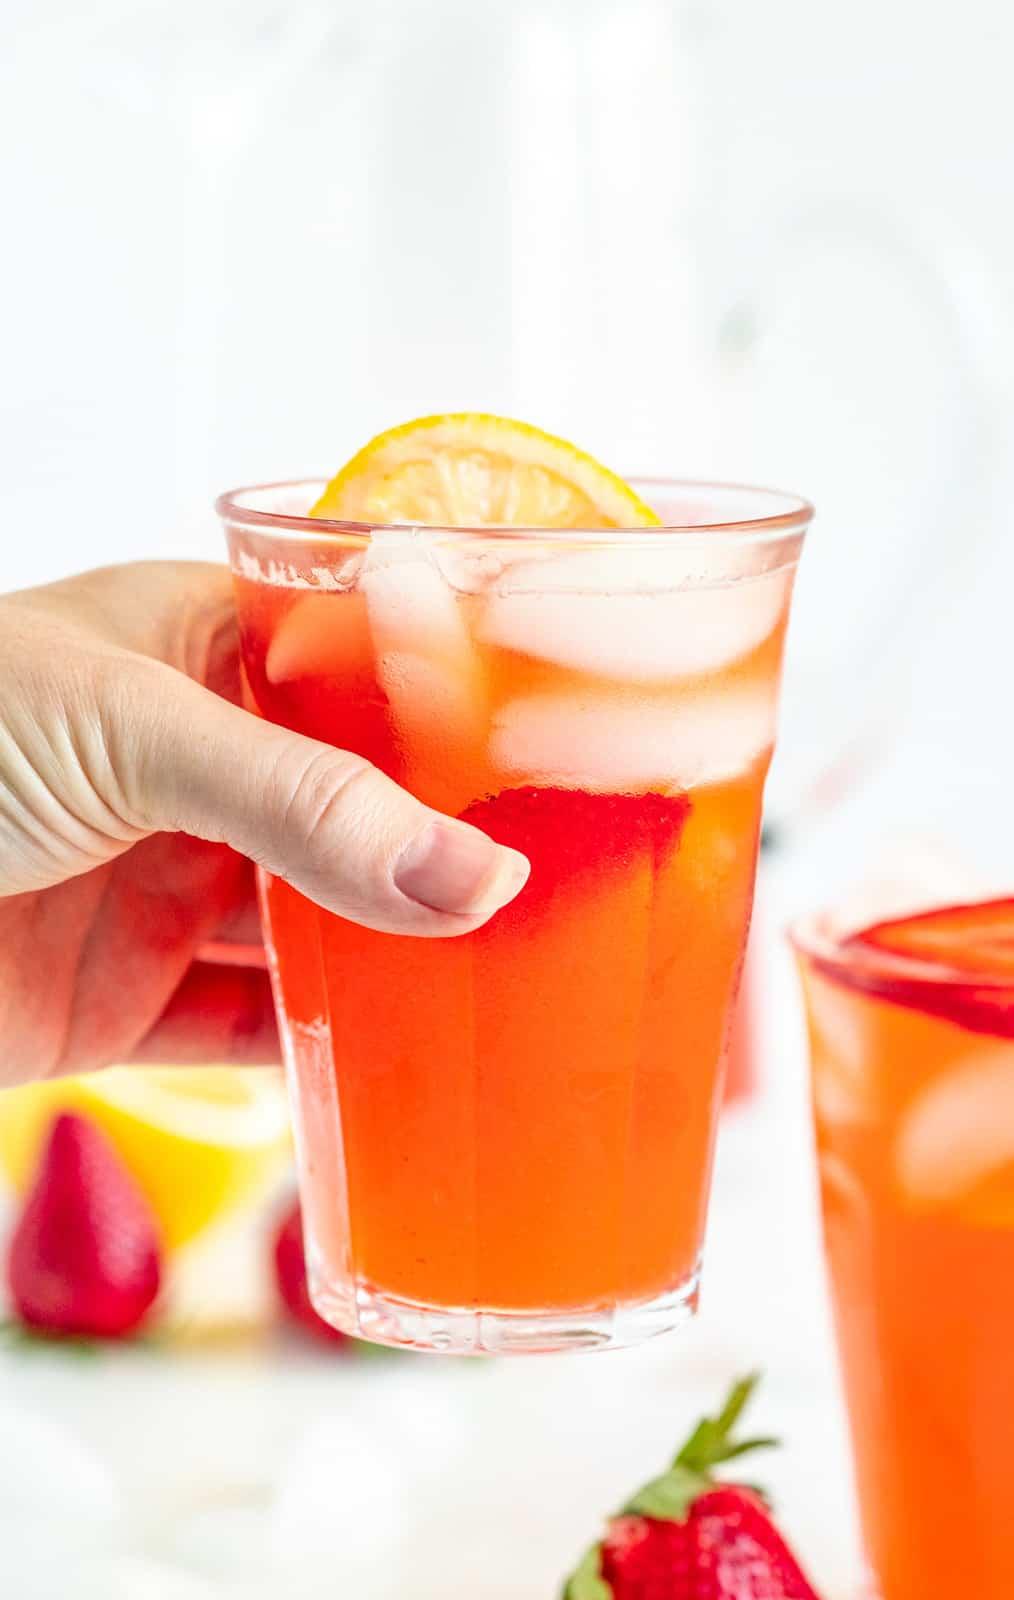 Hand holding up one glass of lemonade